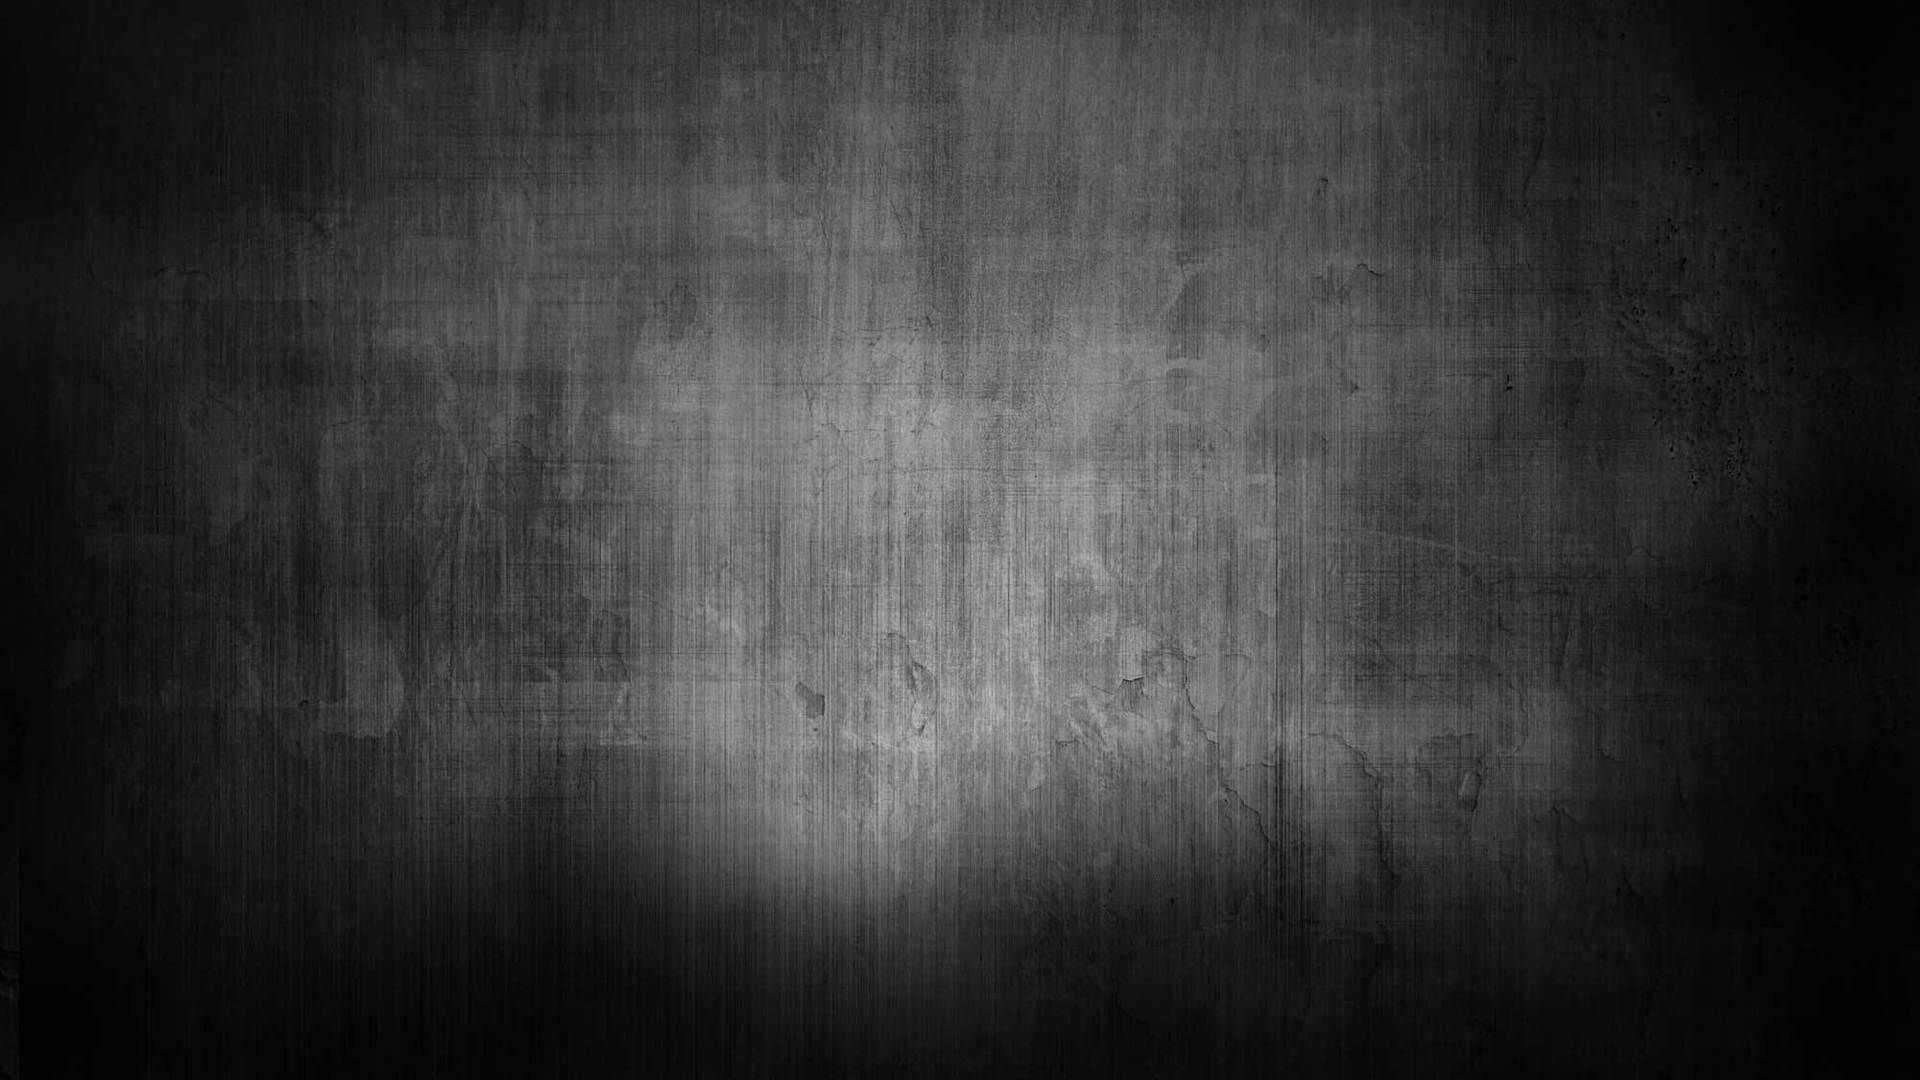 Download Wallpaper Dark Spot Background Texture Hd Background Grey Wallpaper Background Dark Grey Wallpaper Grey Wallpaper